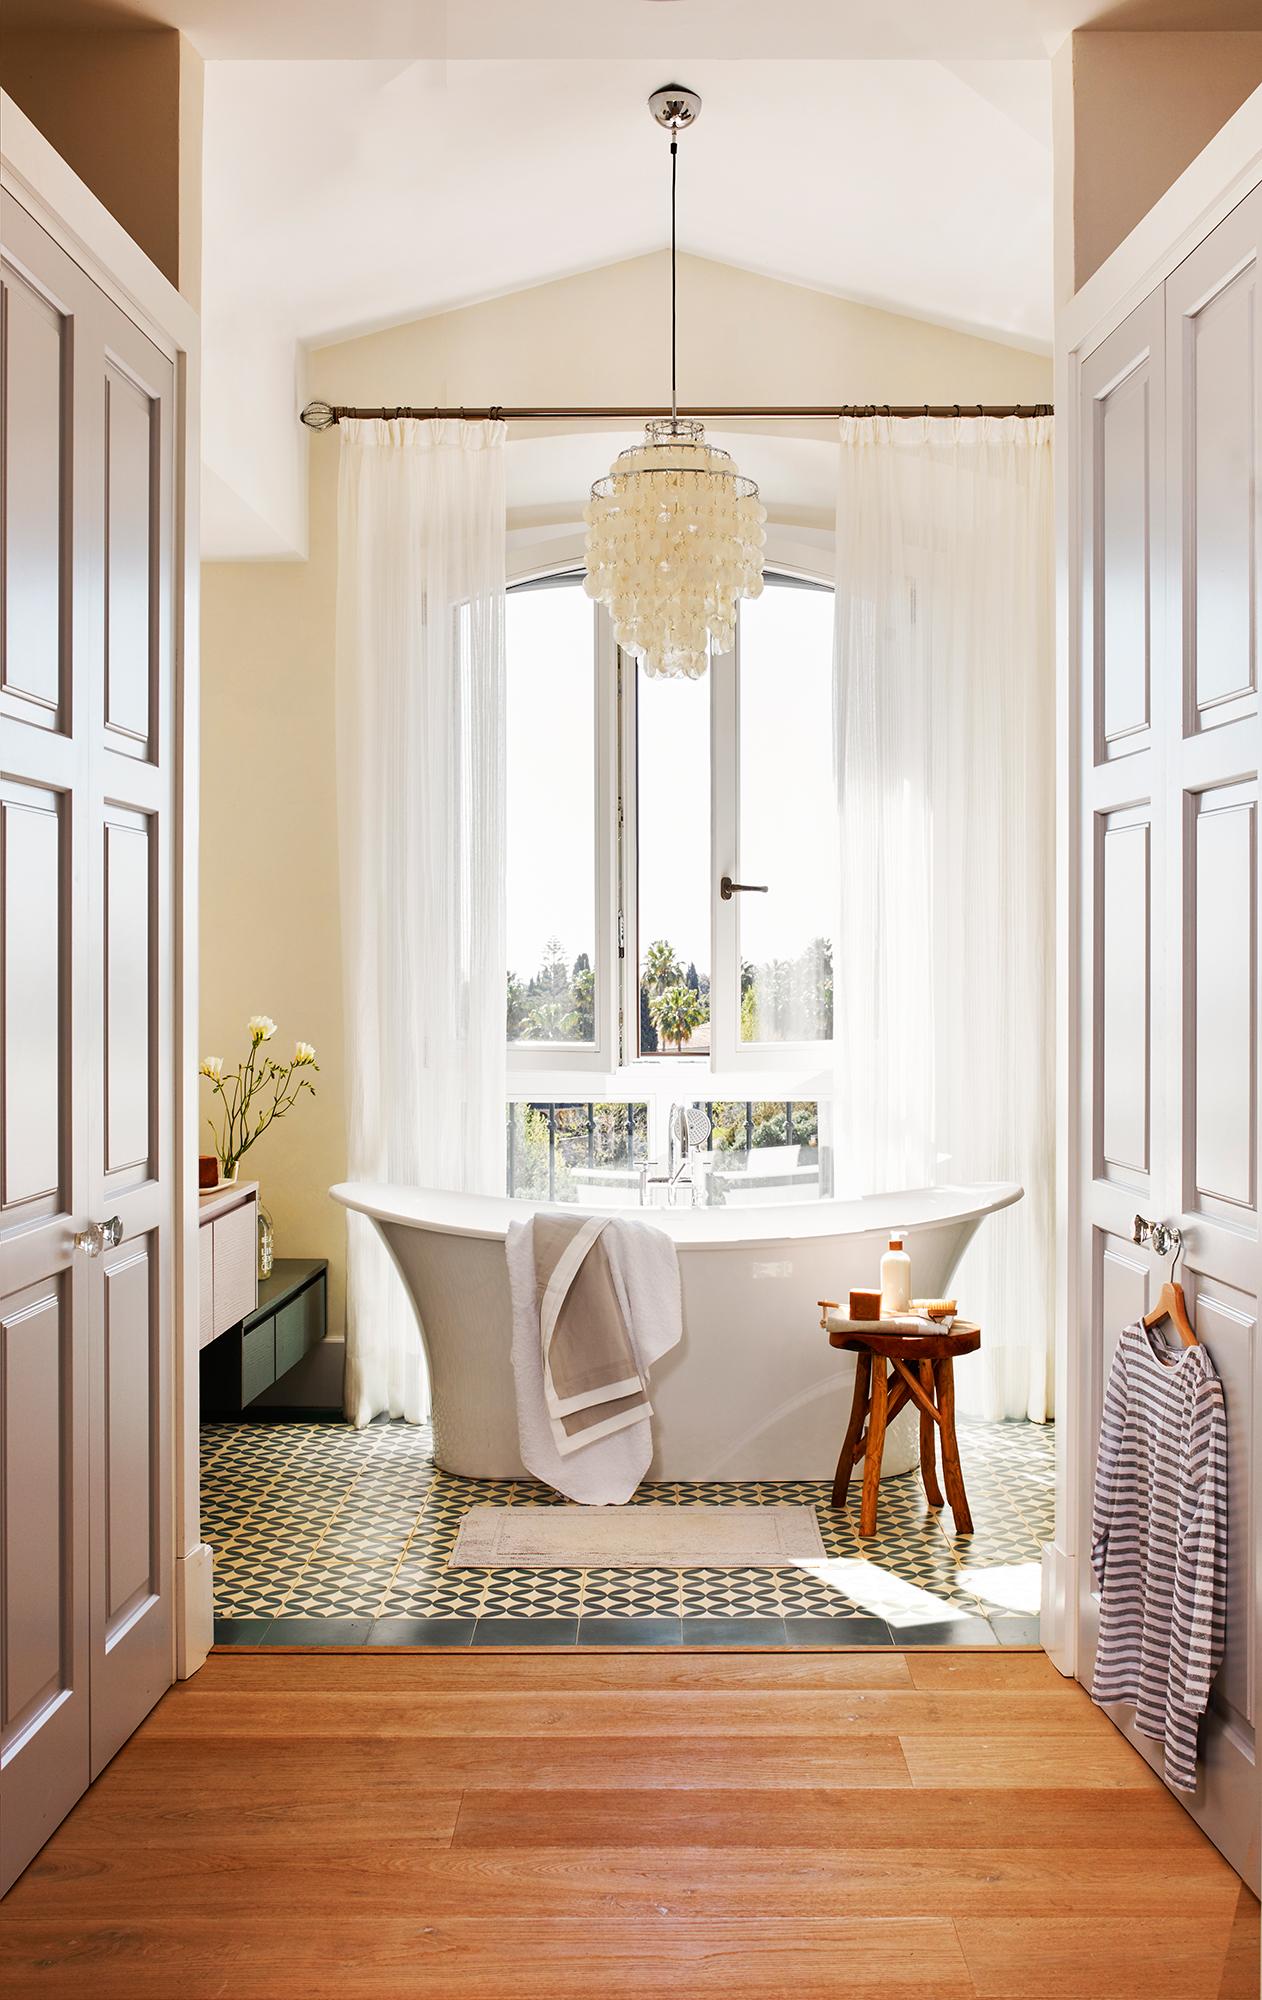 Ba era o ducha pros y contras y claves para elegir for Banos pequenos modernos con banera